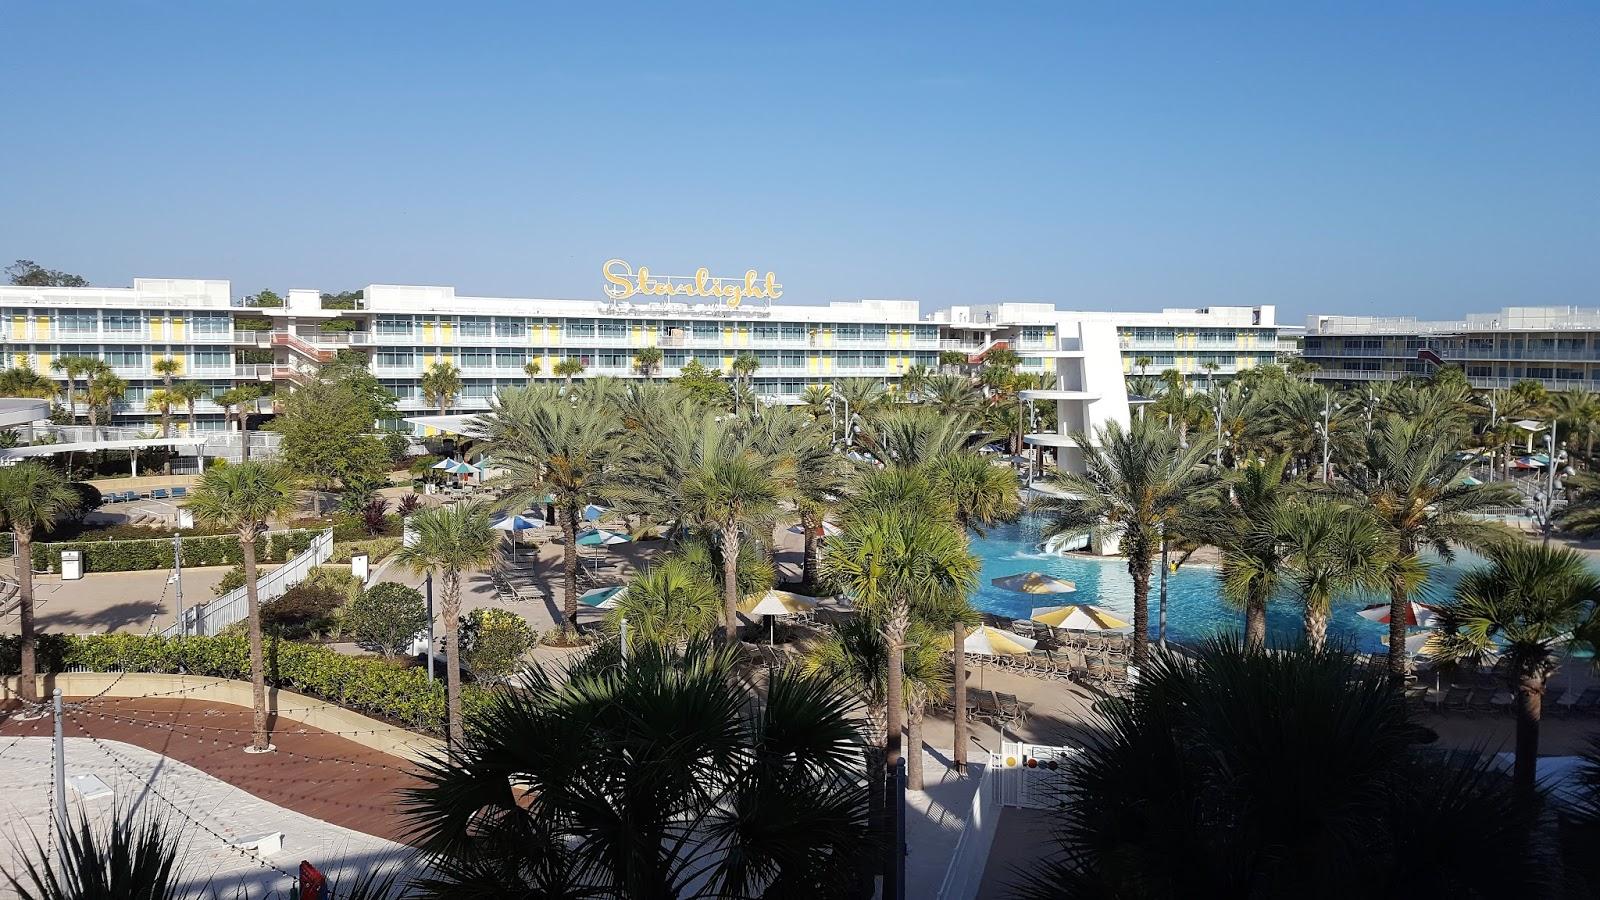 Directions To Cabana Bay Beach Resort